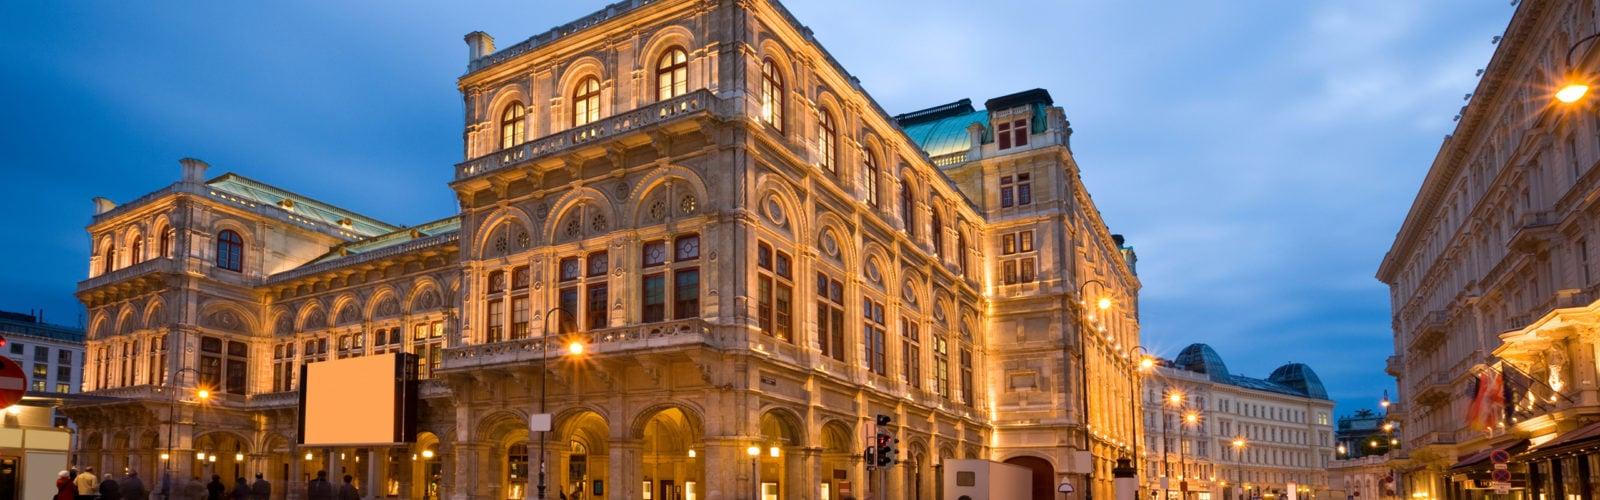 vienna-opera-house-austria